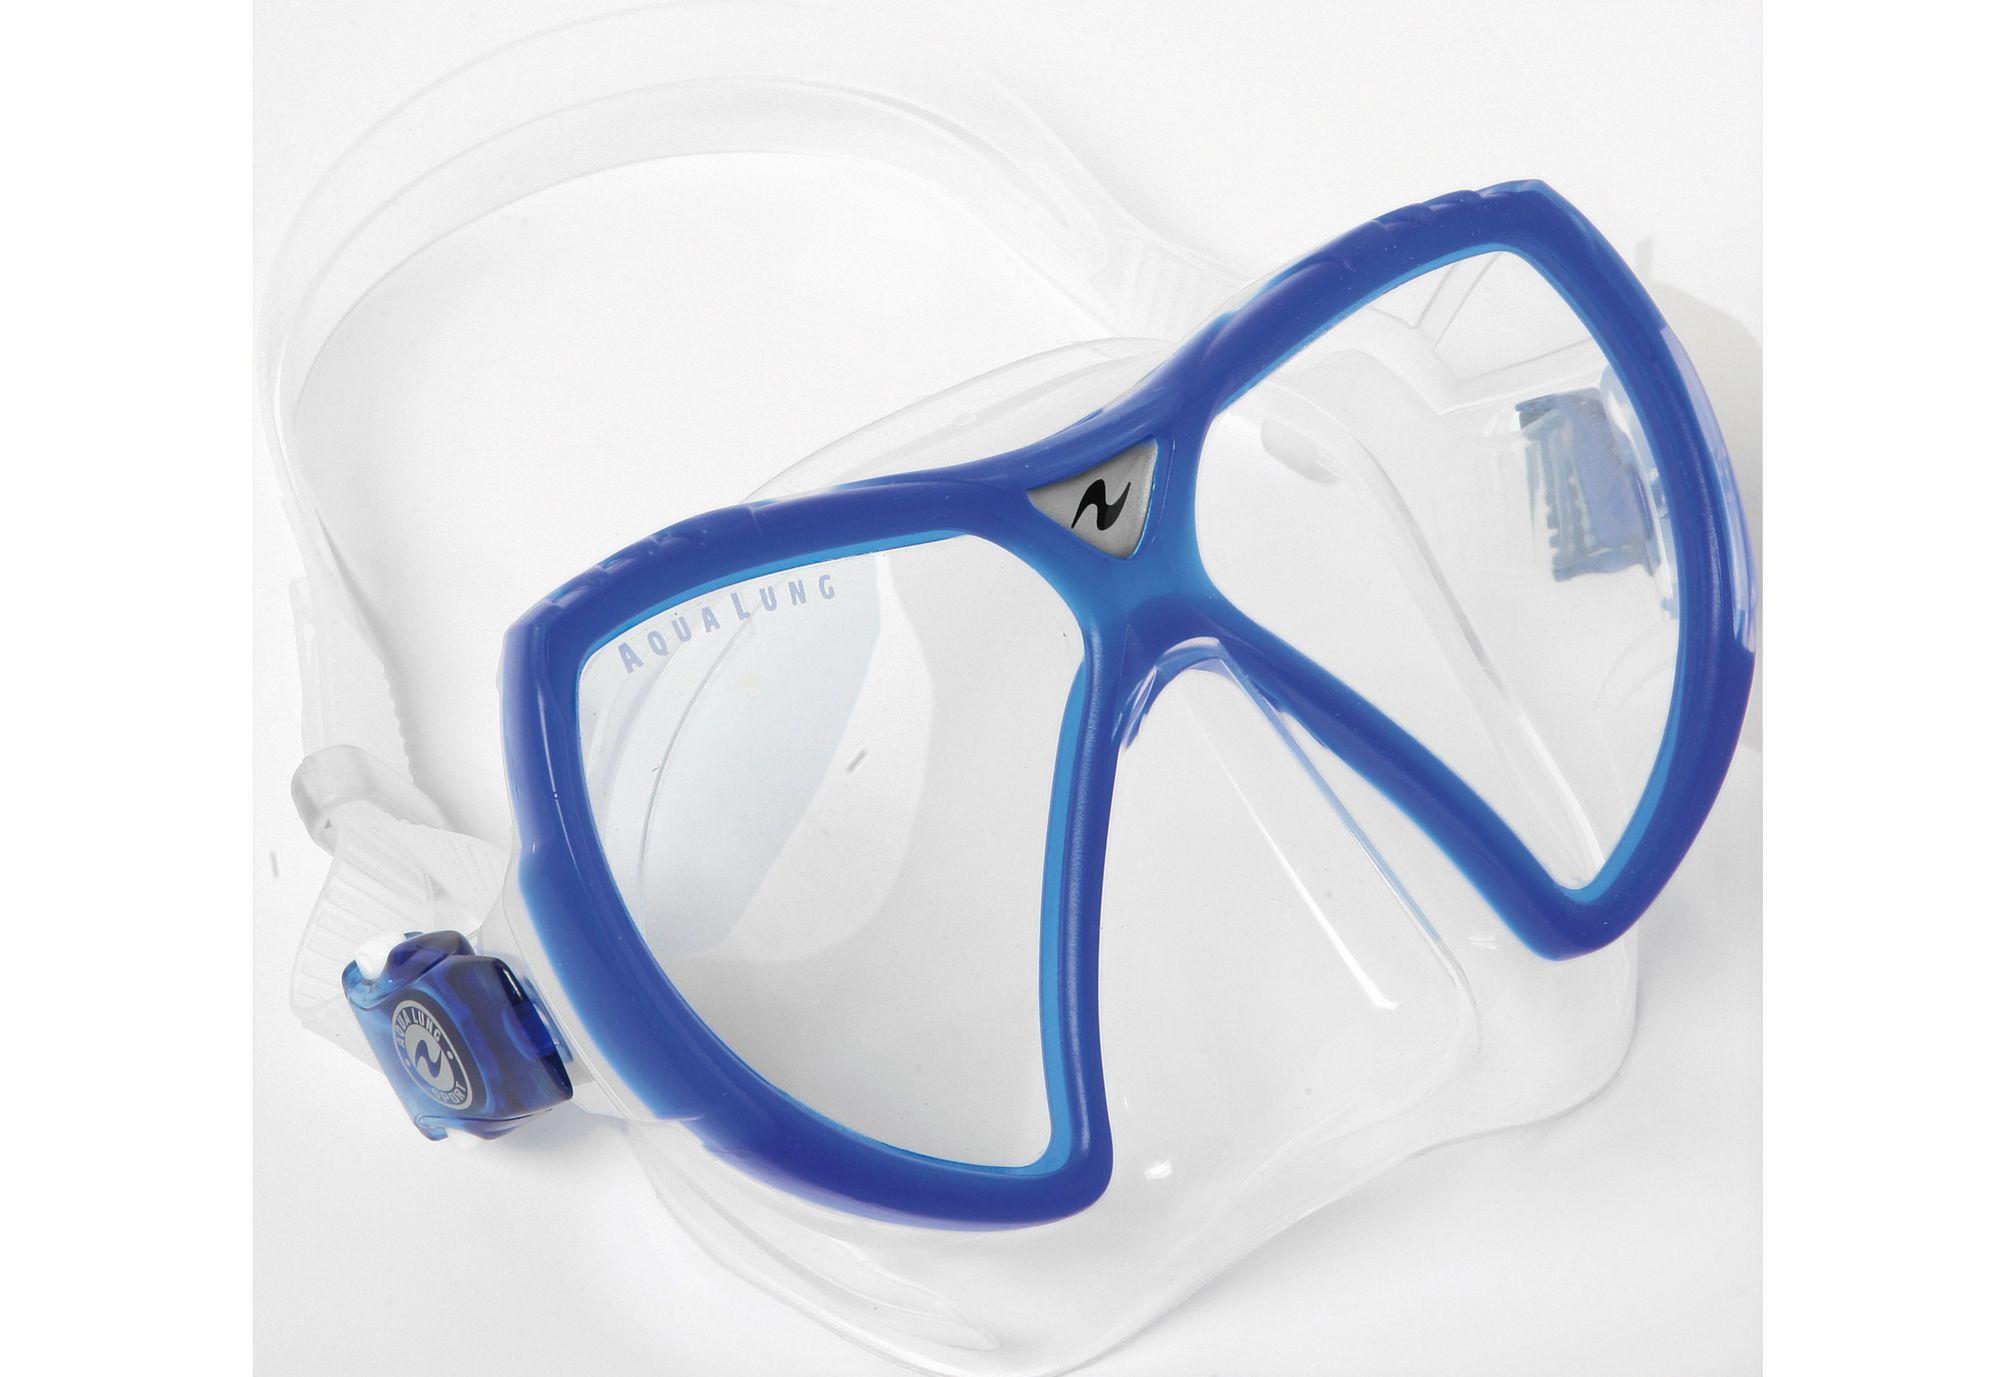 AQUA LUNG SPORT TAUCHMASKE, Aqua Lung Sport, »VISIONFLEX LX«